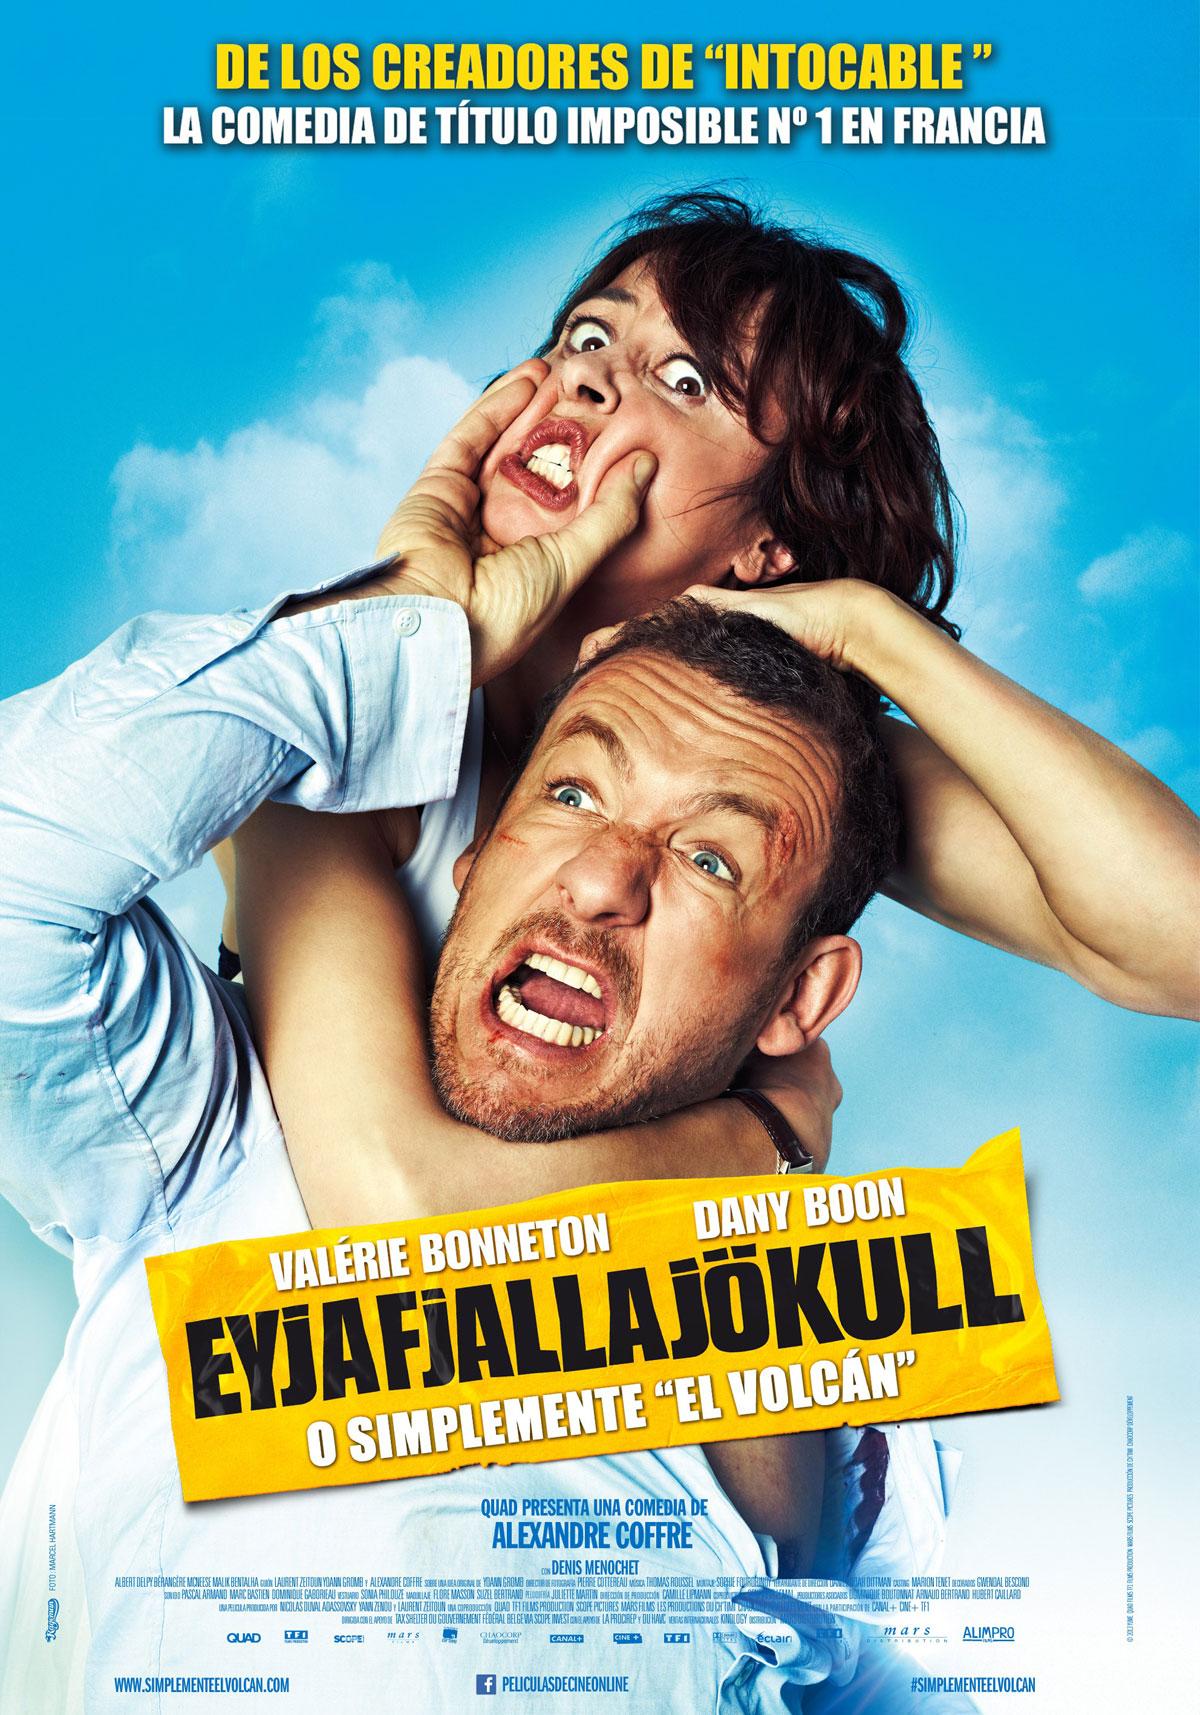 "Eyjafjallajökull (o simplemente ""el volcán"") - Película 2013 - SensaCine.com"